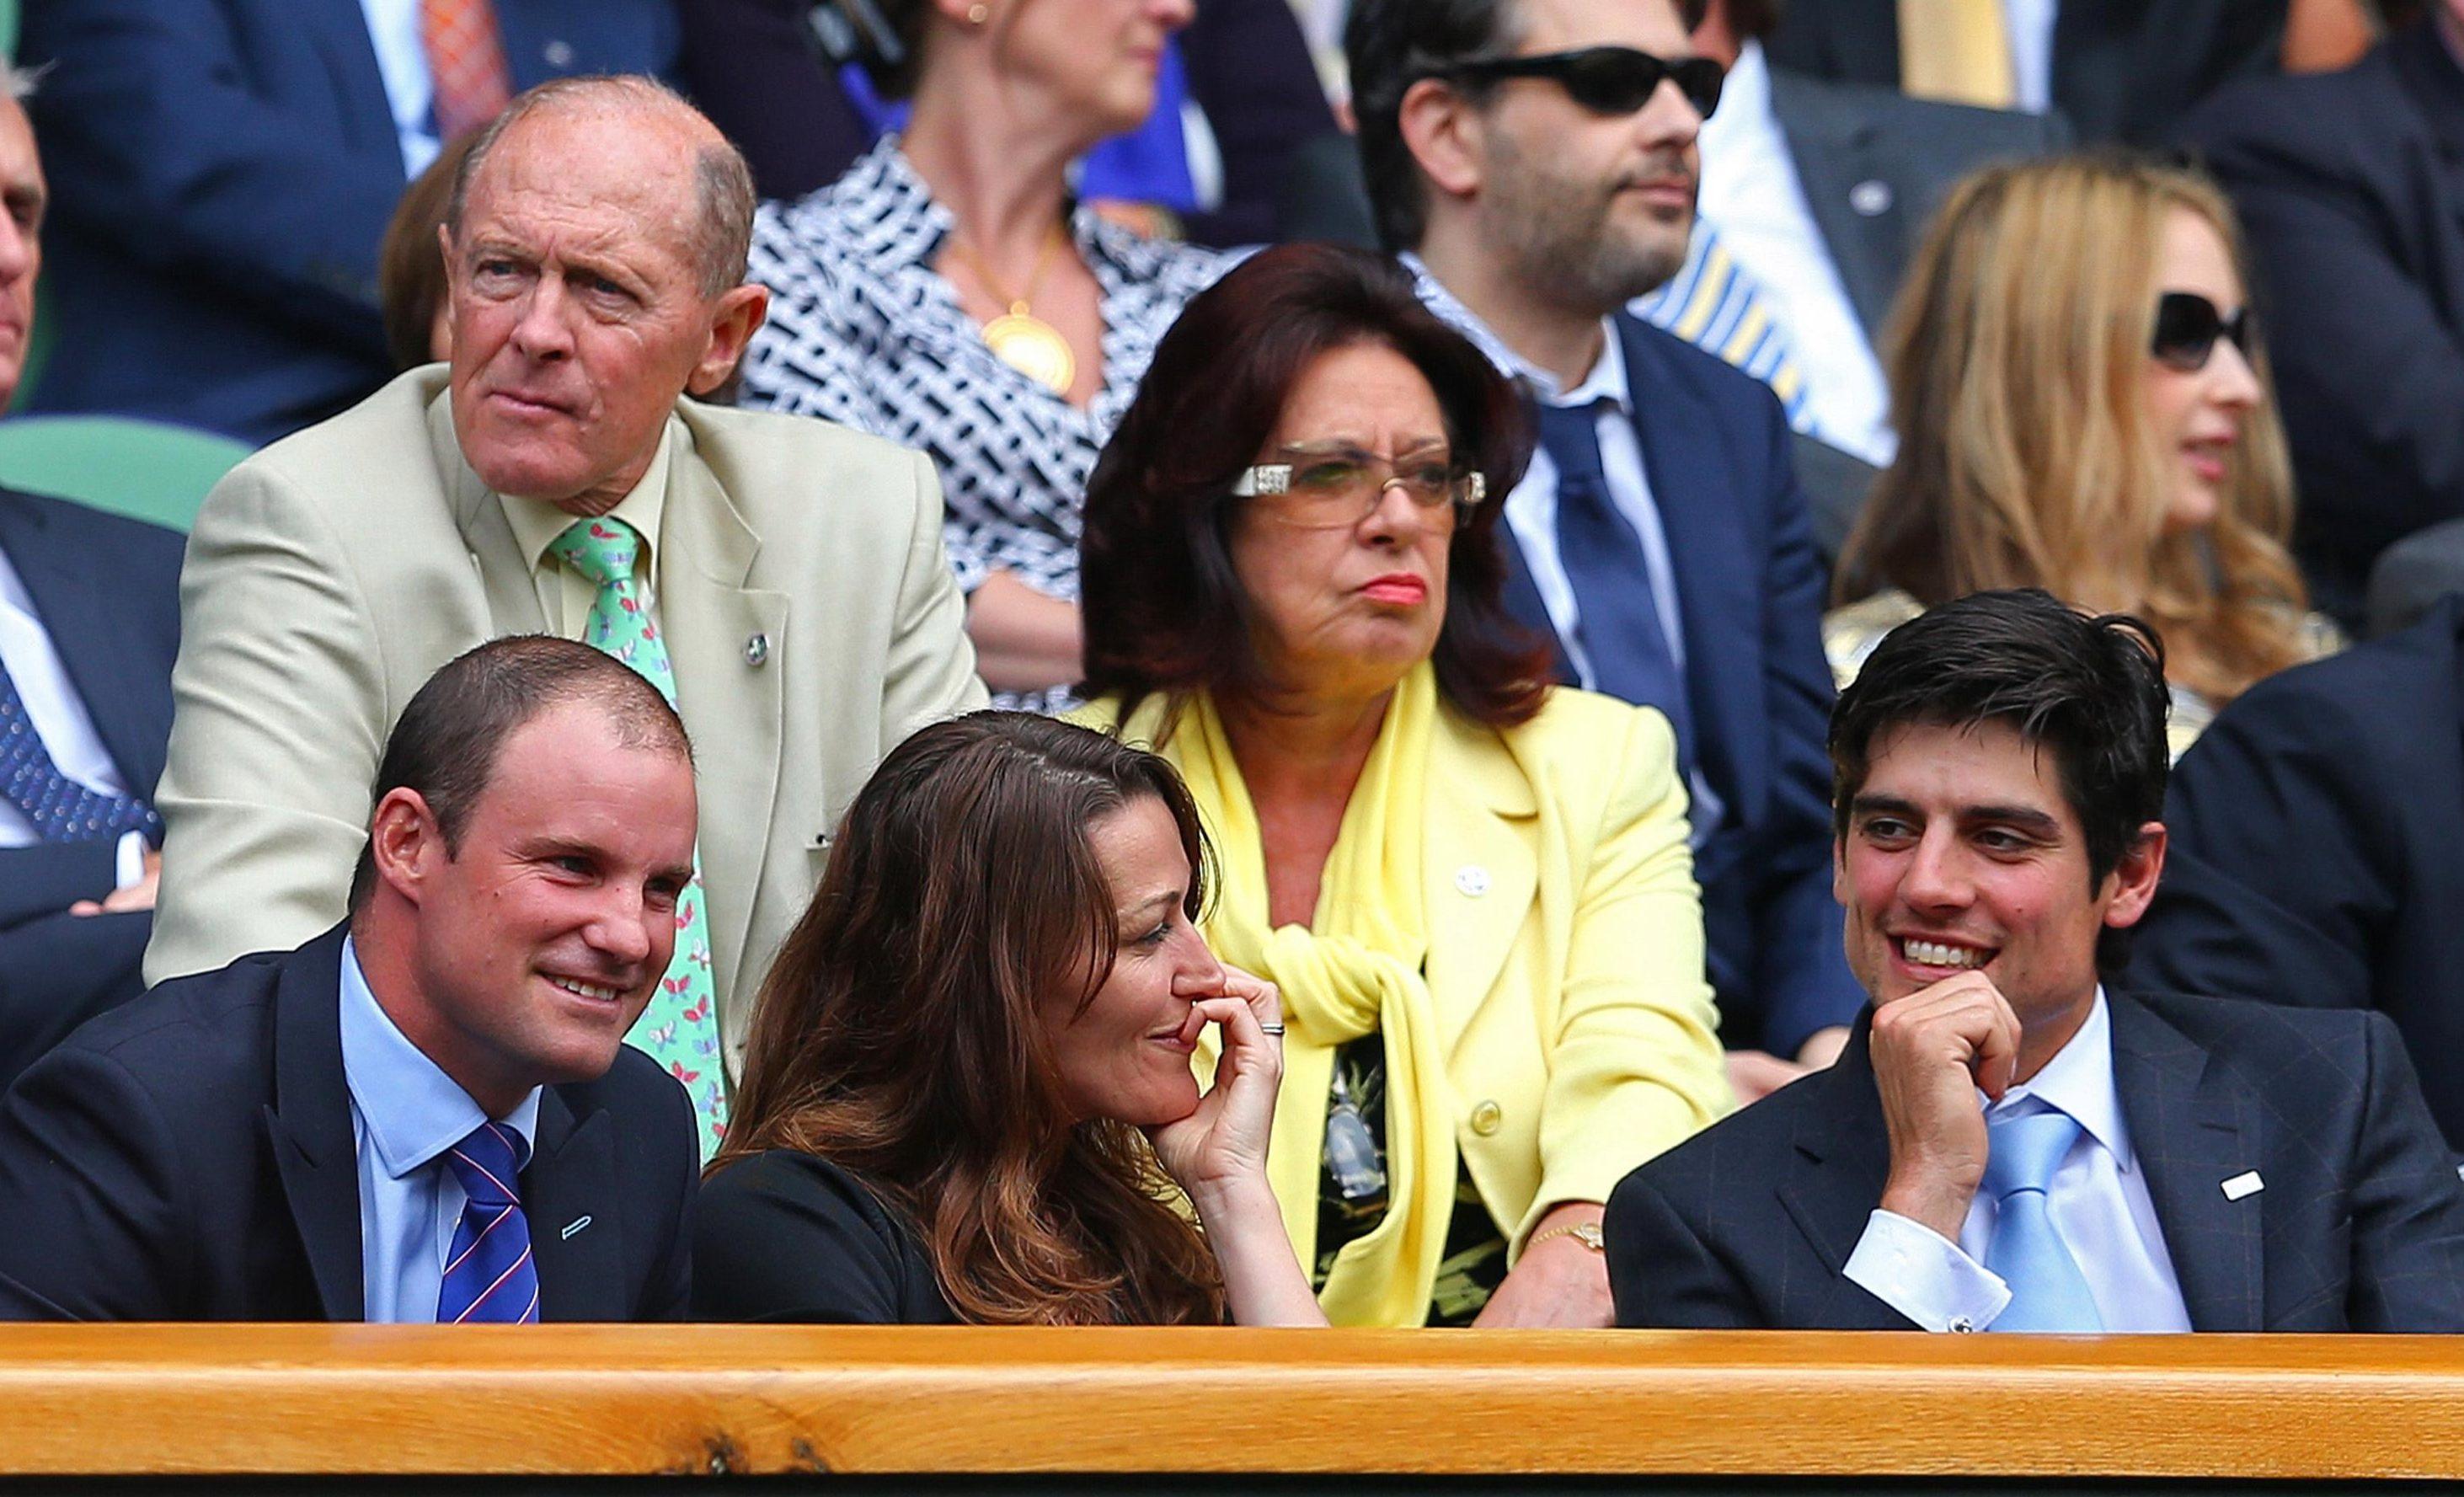 Ruth jokes with England star Alastair Cook at Wimbledon, next to her husband